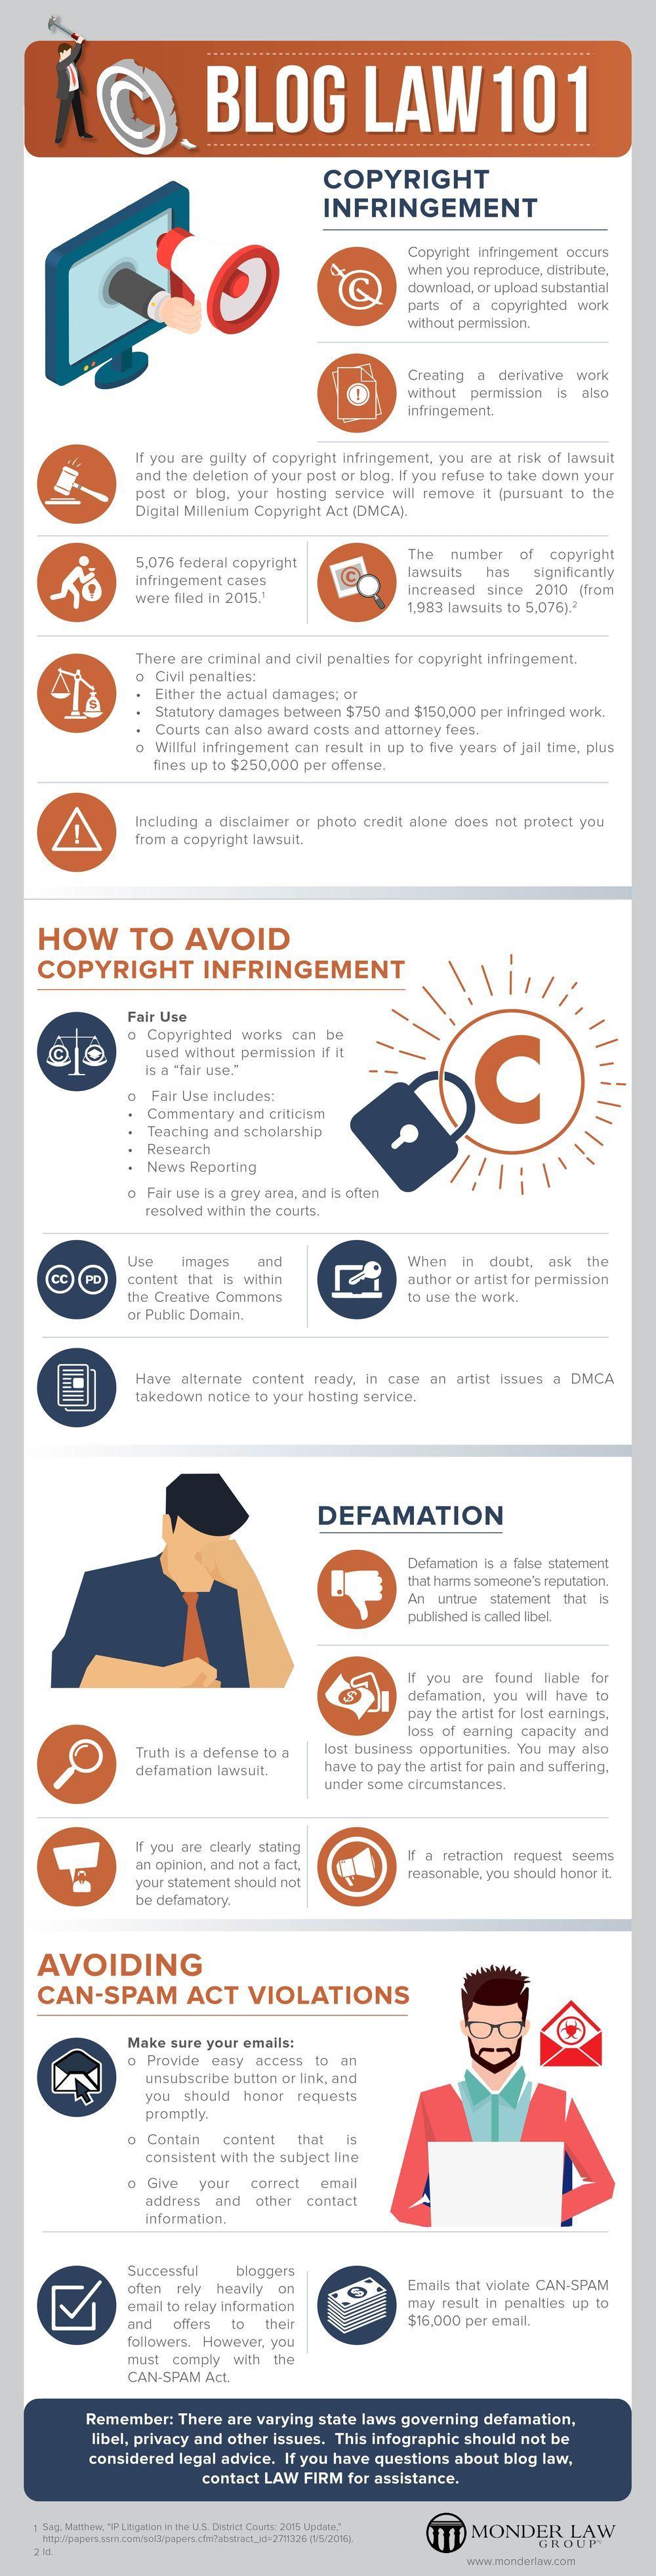 Blog Law info